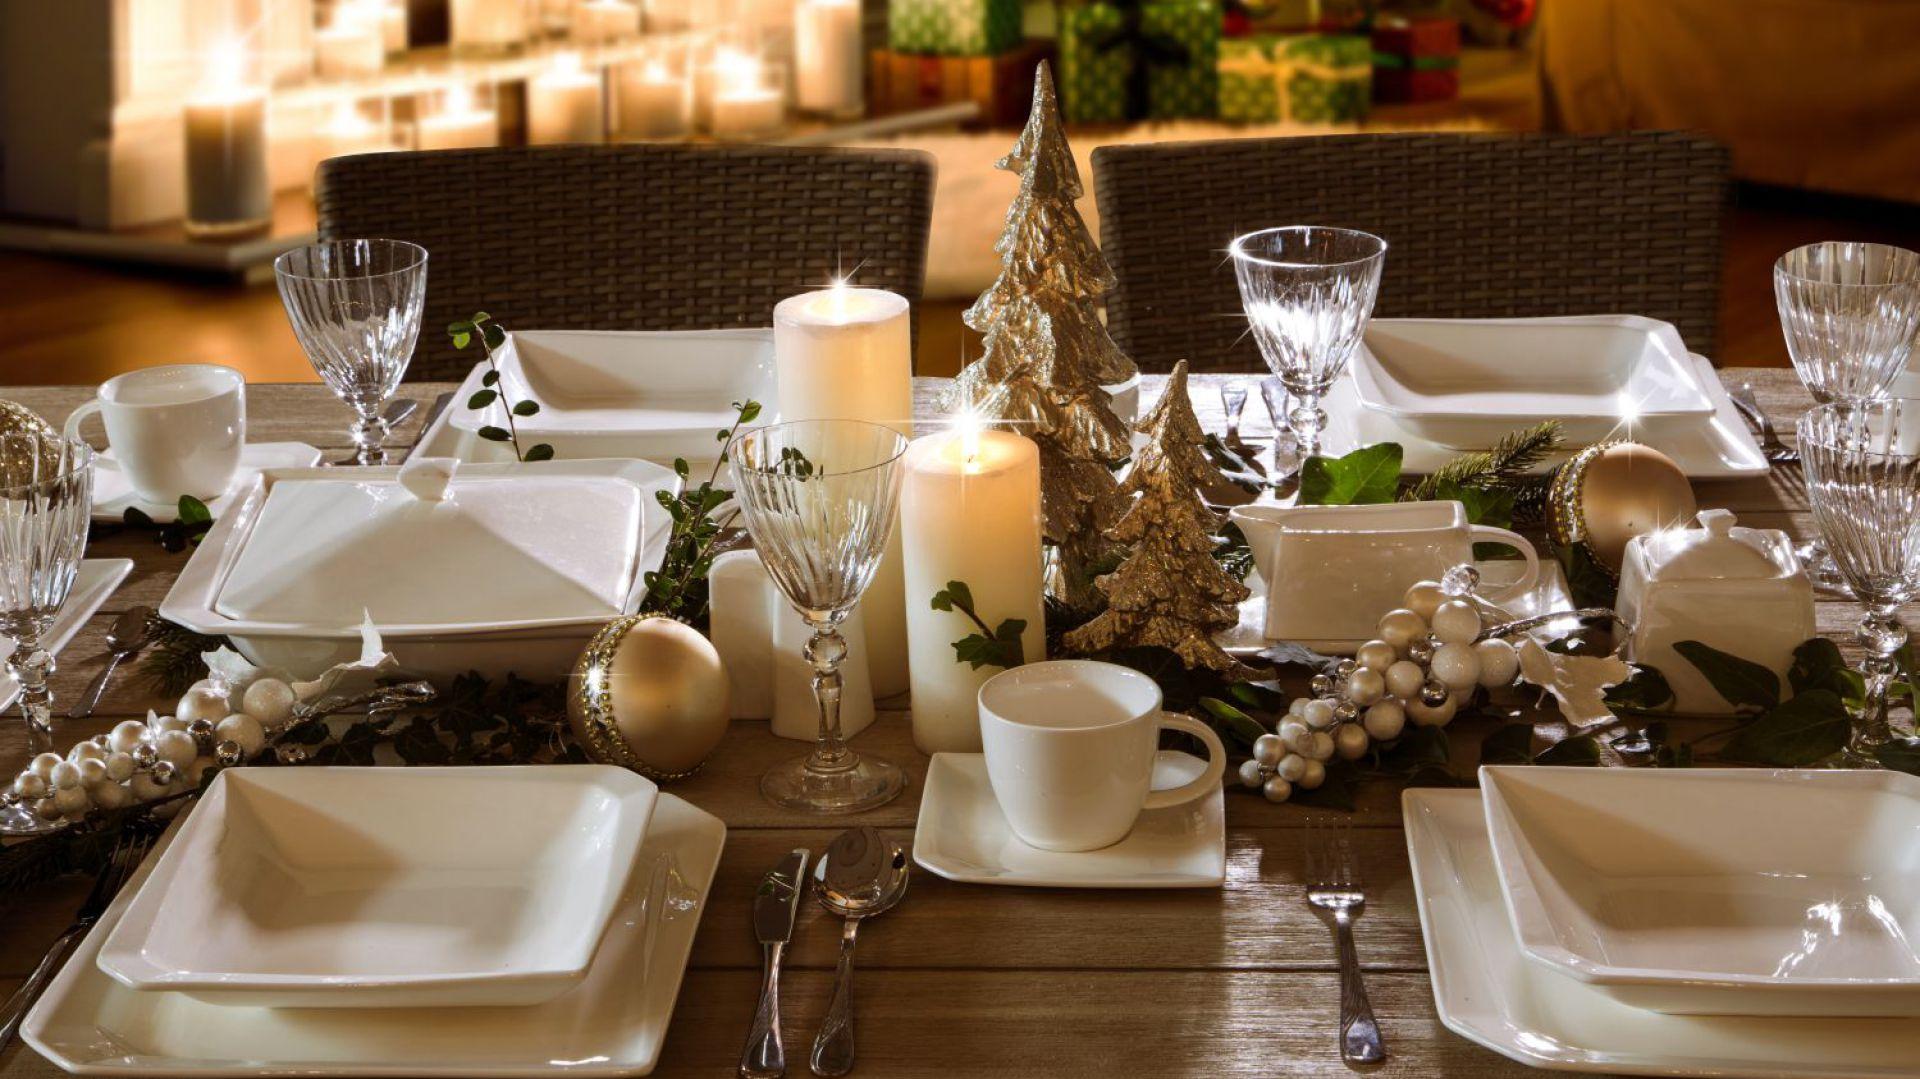 Stół na święta. Fot. Eurofirany